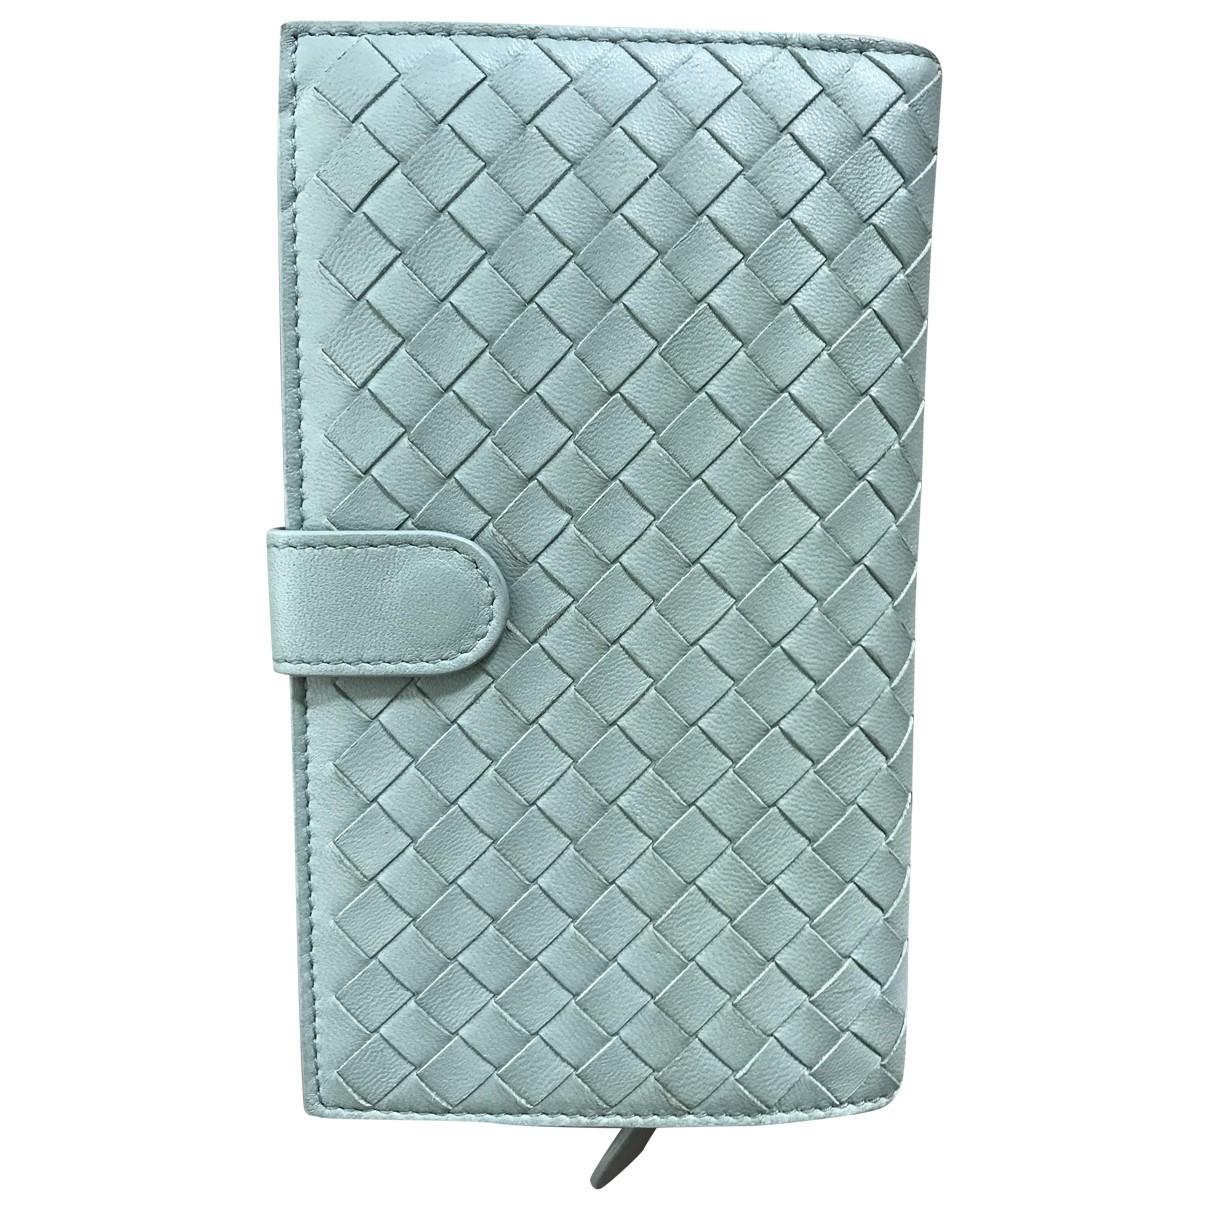 Bottega Veneta Intrecciato Green Leather wallet for Women \N